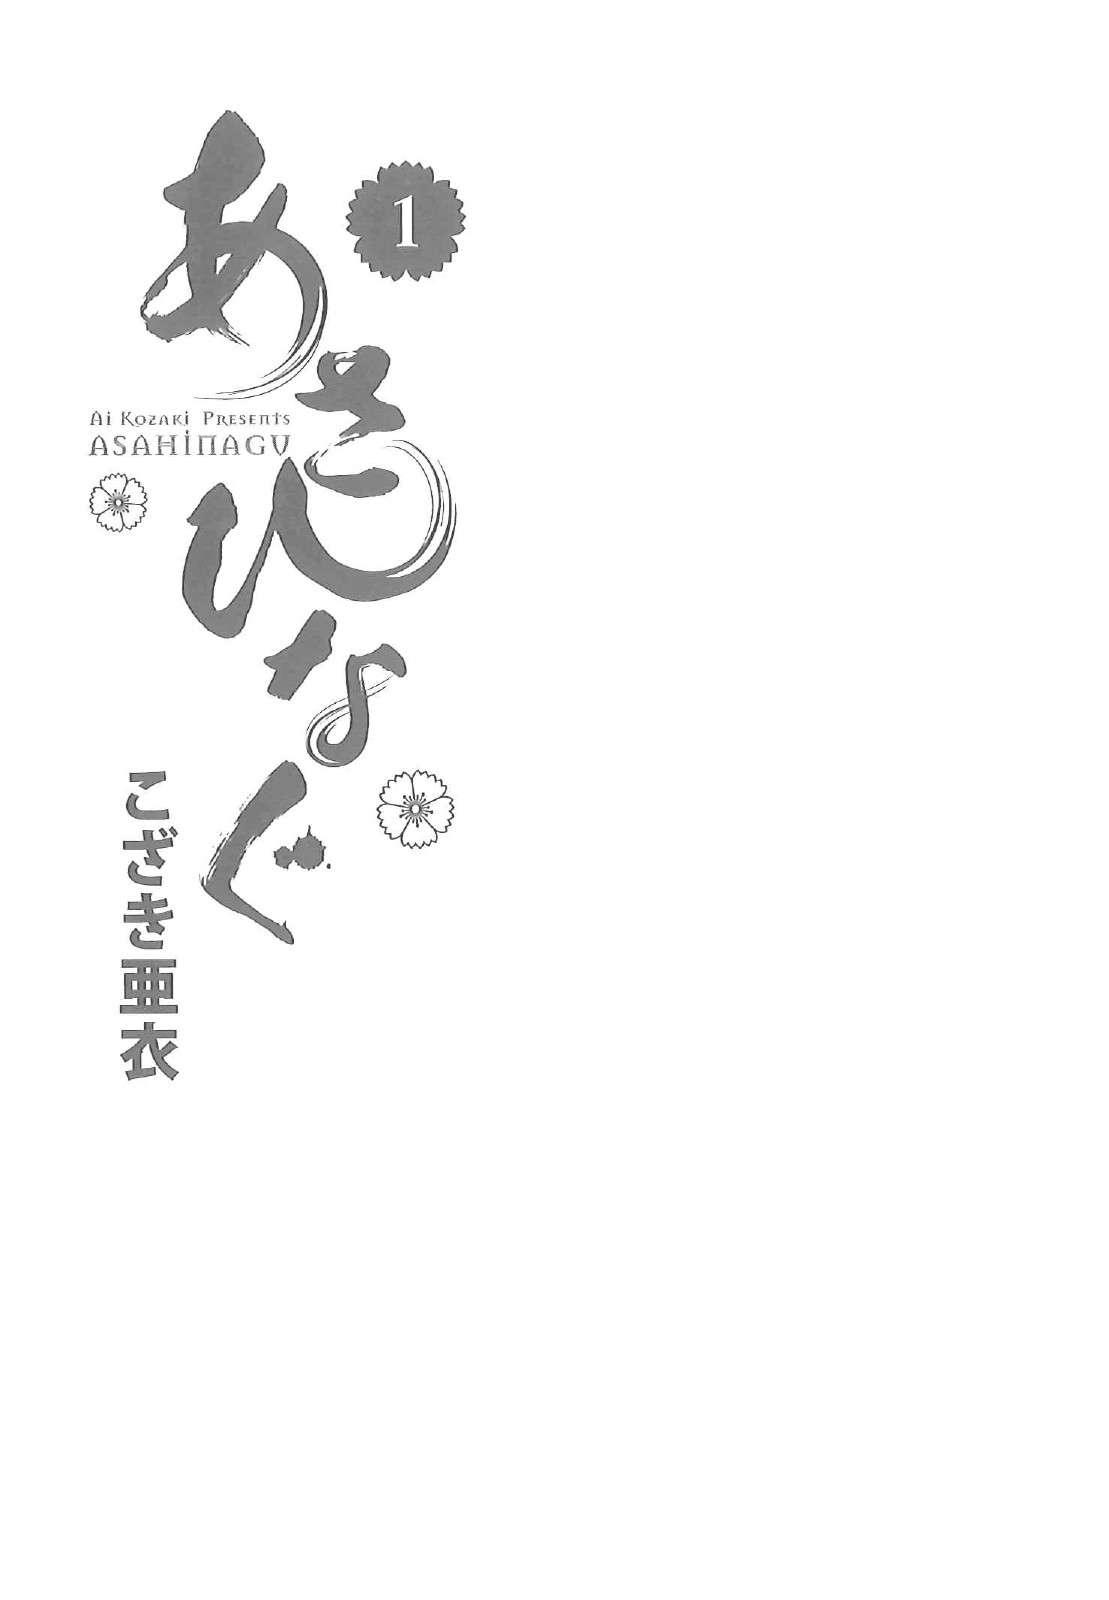 http://c5.ninemanga.com/es_manga/15/16015/382897/cccd67bfbf3c8b06b5f6d7ce7798c85b.jpg Page 4